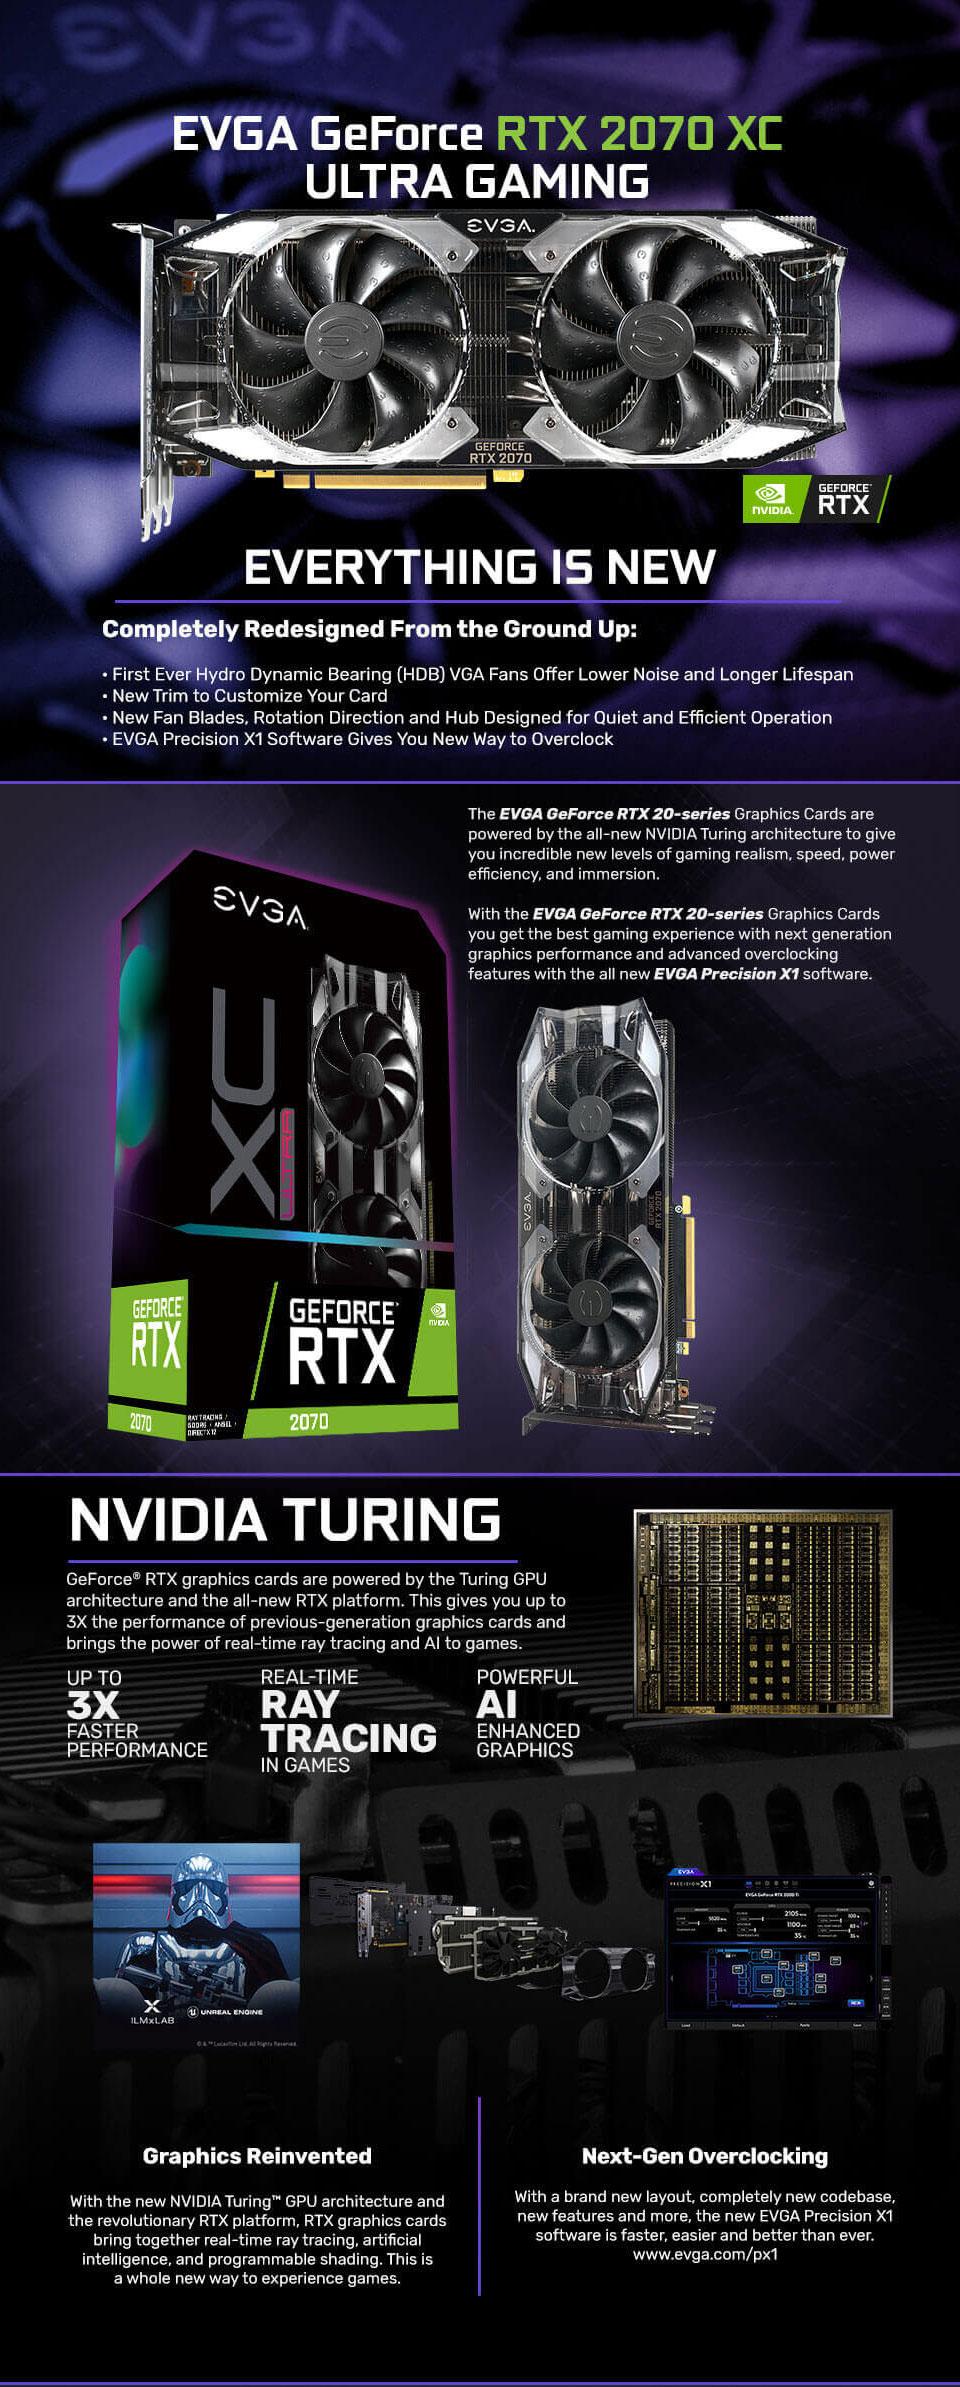 EVGA GeForce RTX 2070 XC Ultra Gaming 8G [08G-P4-2173-KR